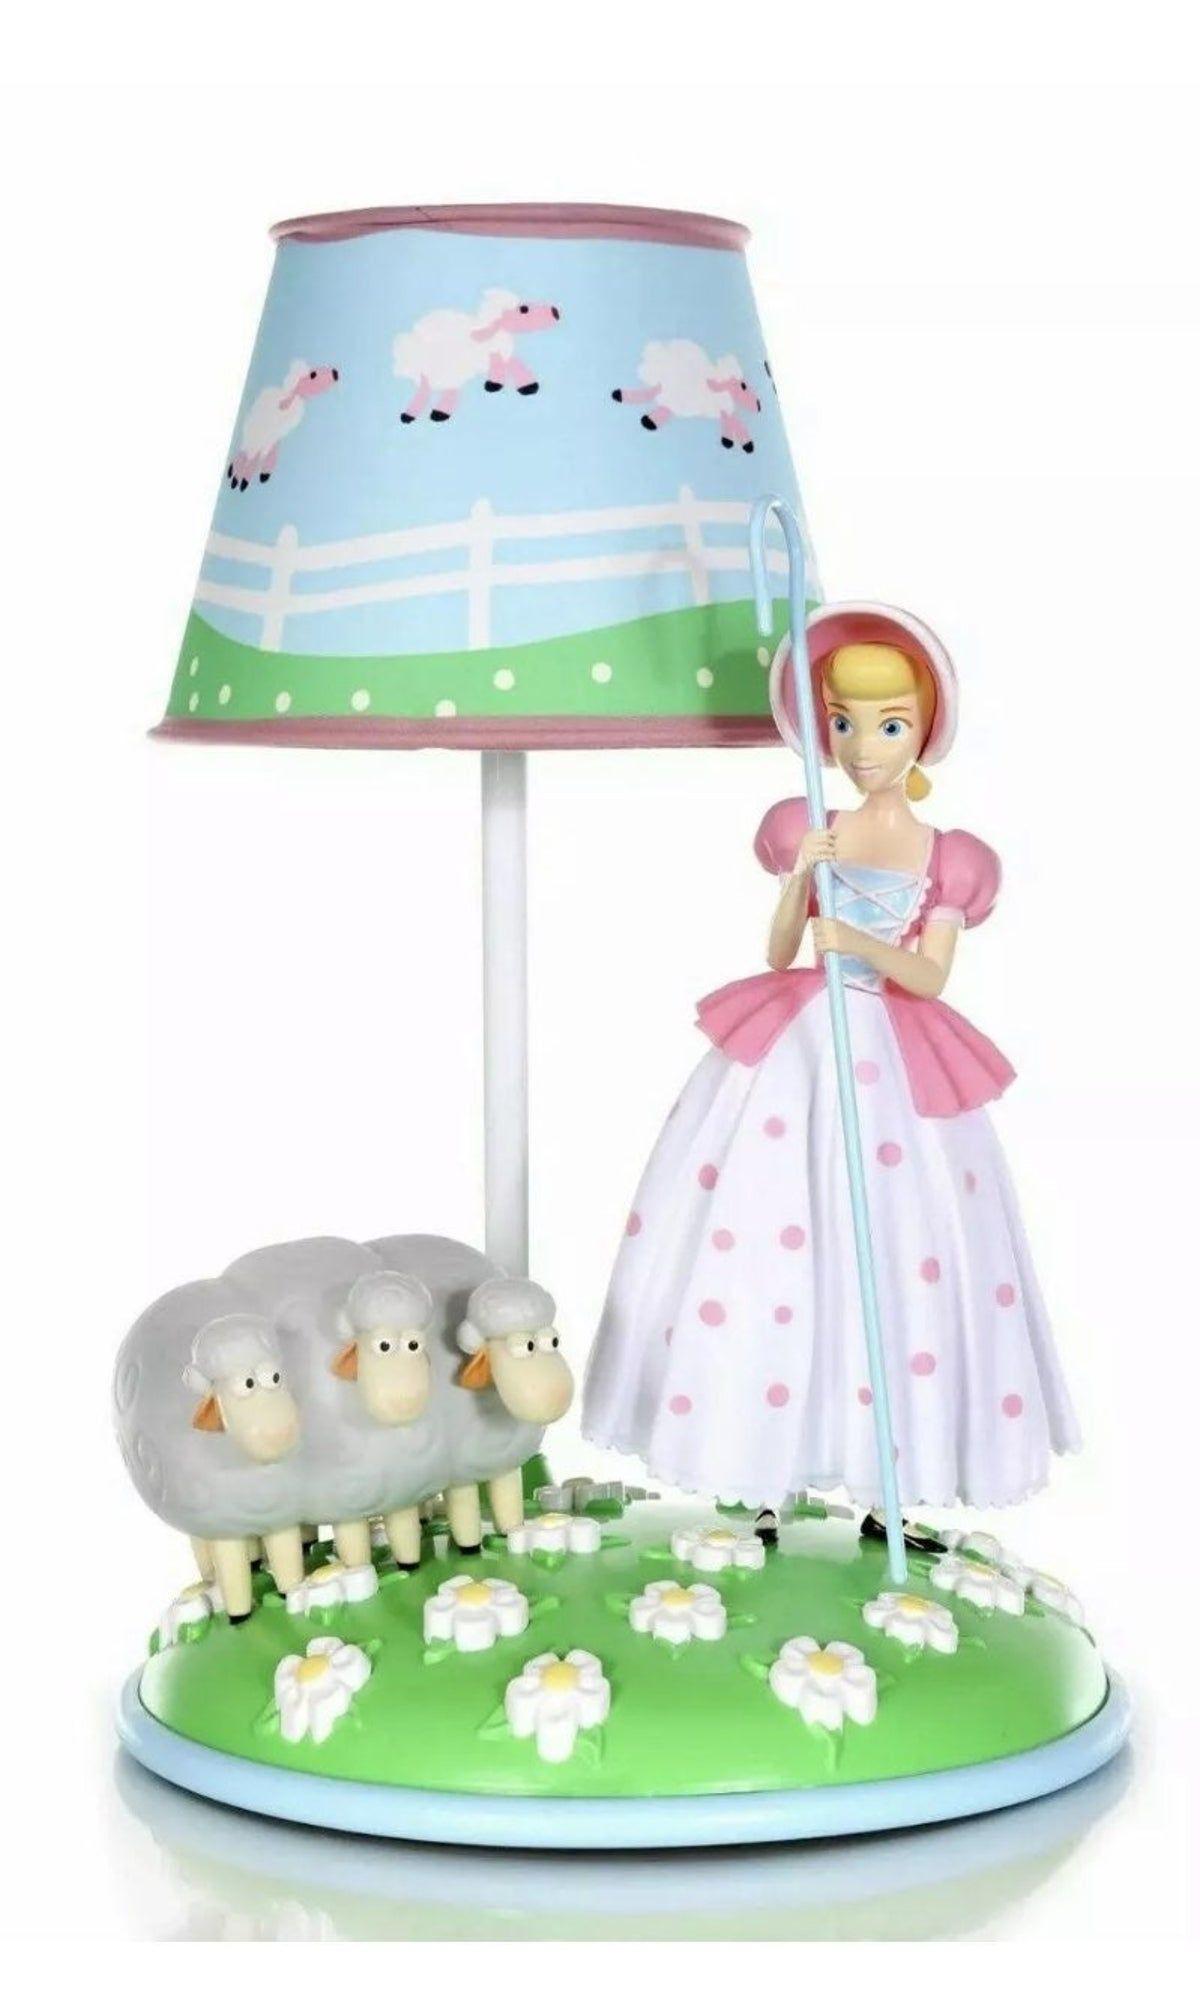 Disney Pixar Toy Story 4 Bopeep Lamp 201 On Mercari In 2020 Pixar Toys Mood Light Disney Pixar